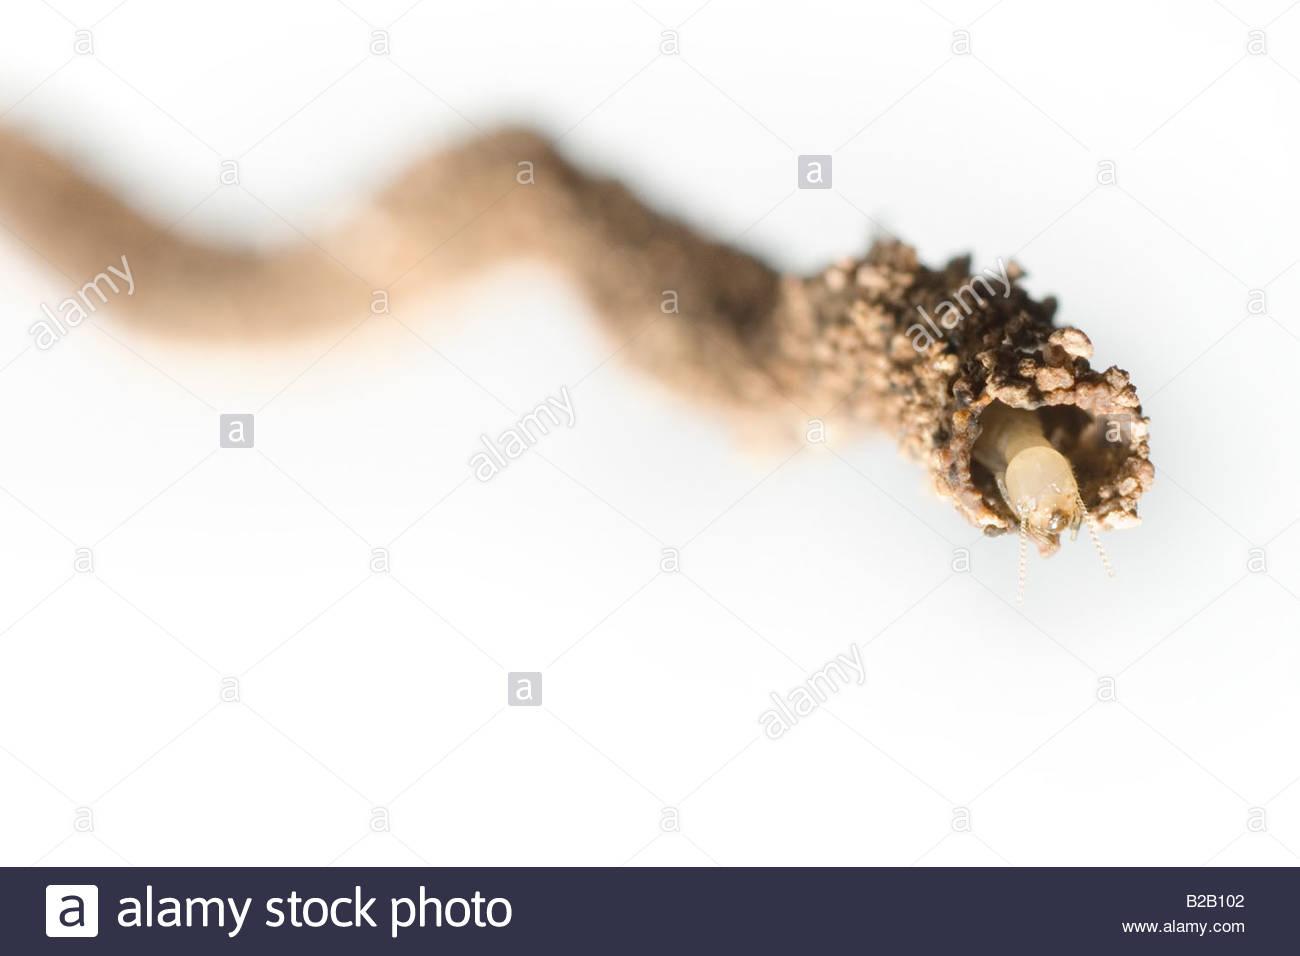 B And B Termites Stock Photo - Termites build a